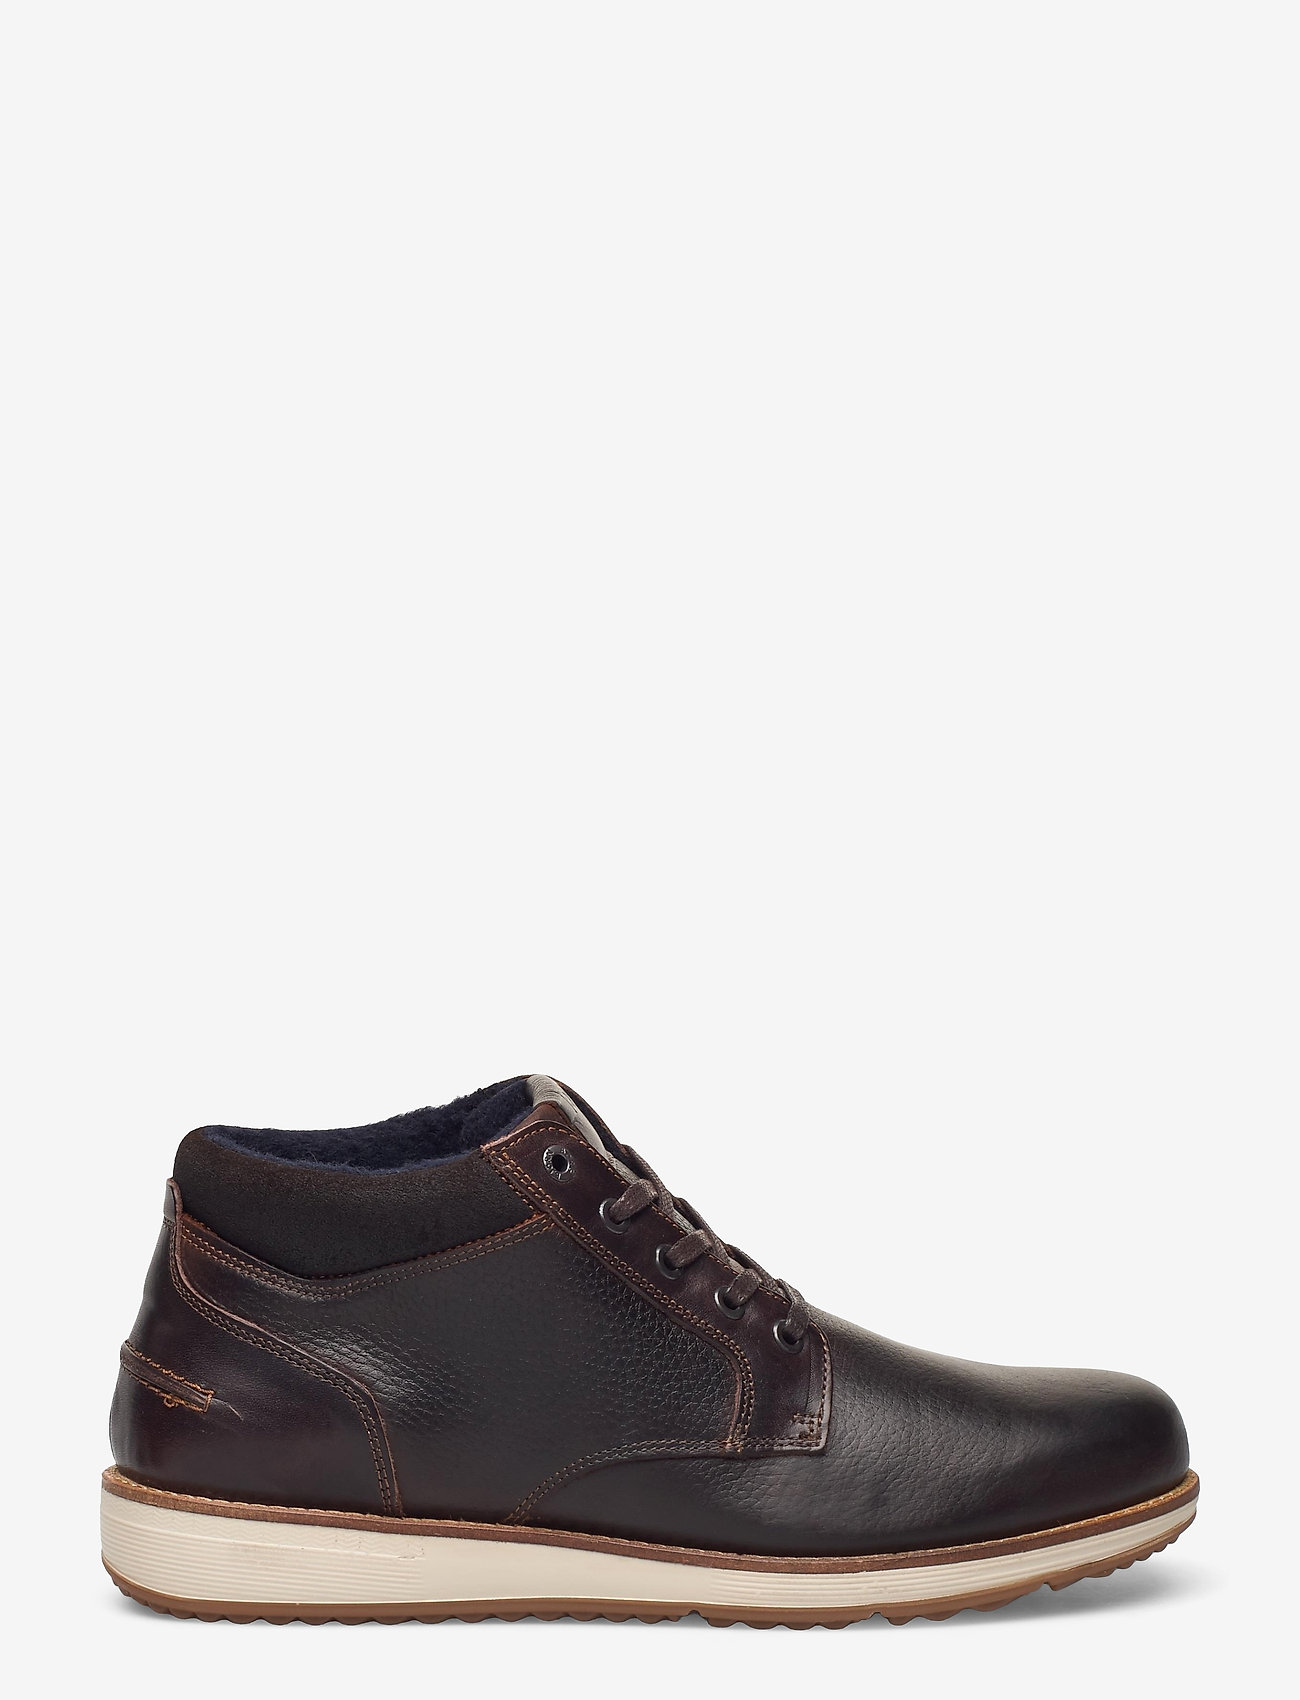 Björn Borg - SUNDAL MID TMB M - laced boots - dark brown - 1